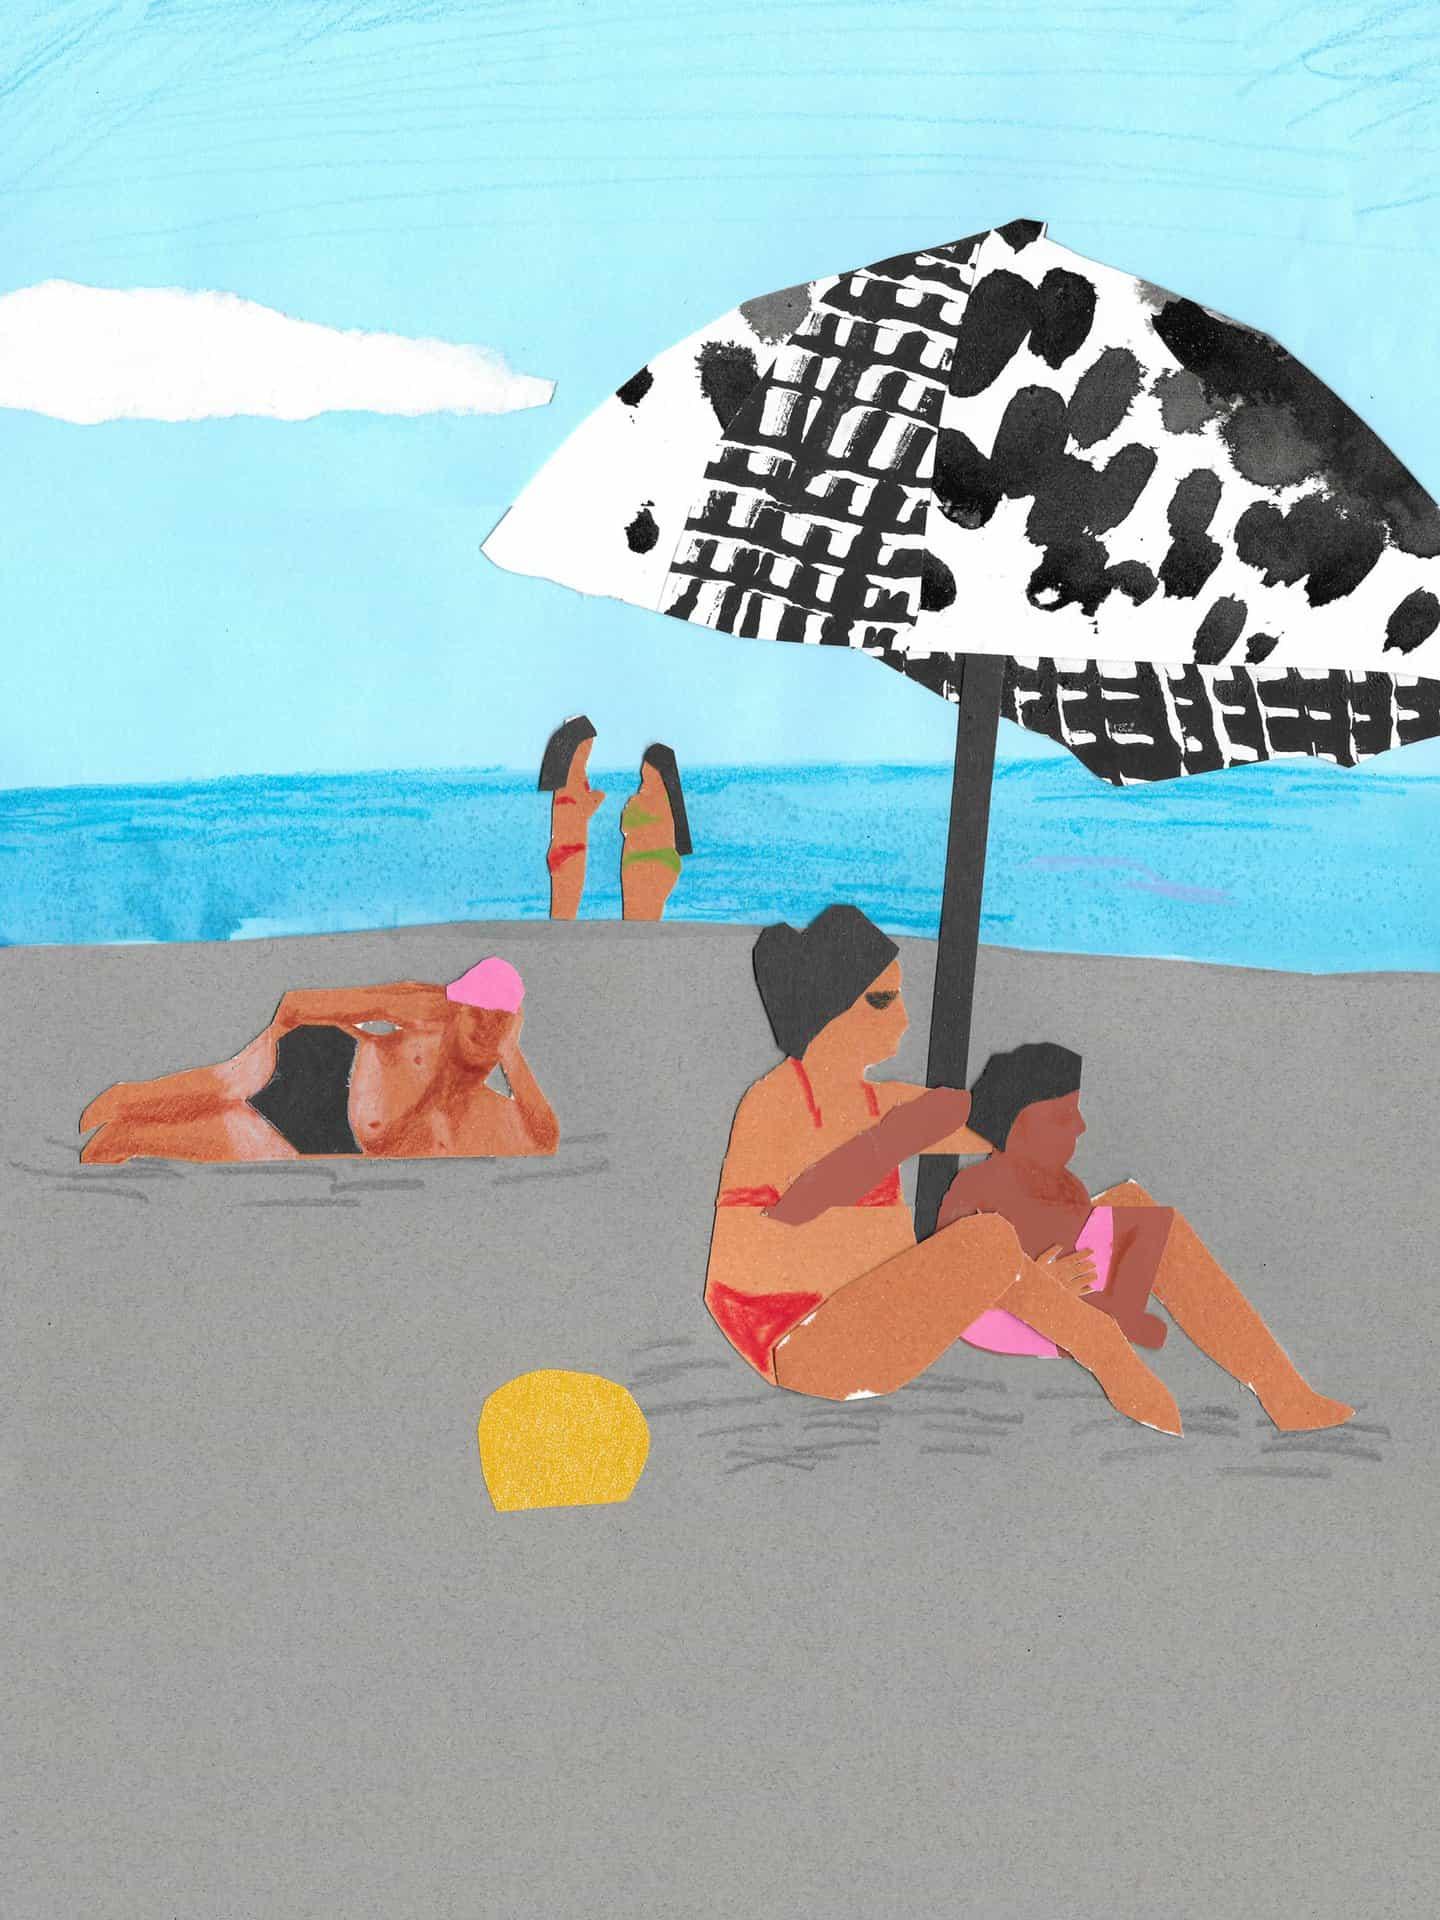 Katy Welsh: Playa (Copyright © Katy Welsh, 2021)